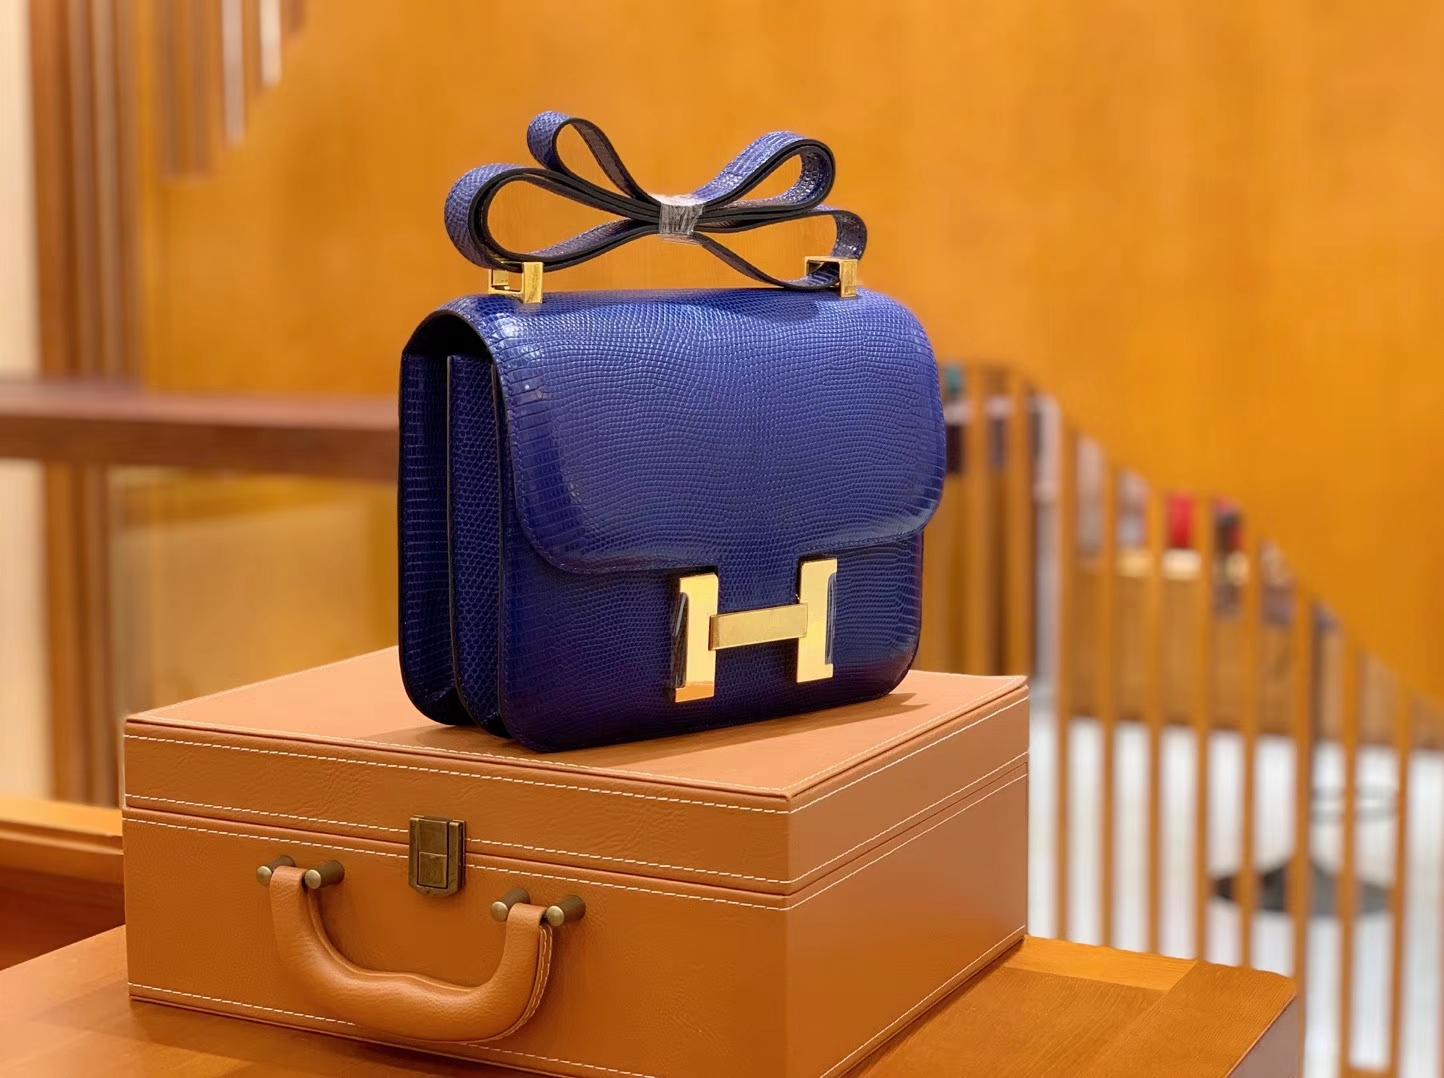 Hermès(爱马仕)Constance 空姐包 琉璃蓝 野生蜥蜴皮 全手工缝制 23cm 金扣 现货